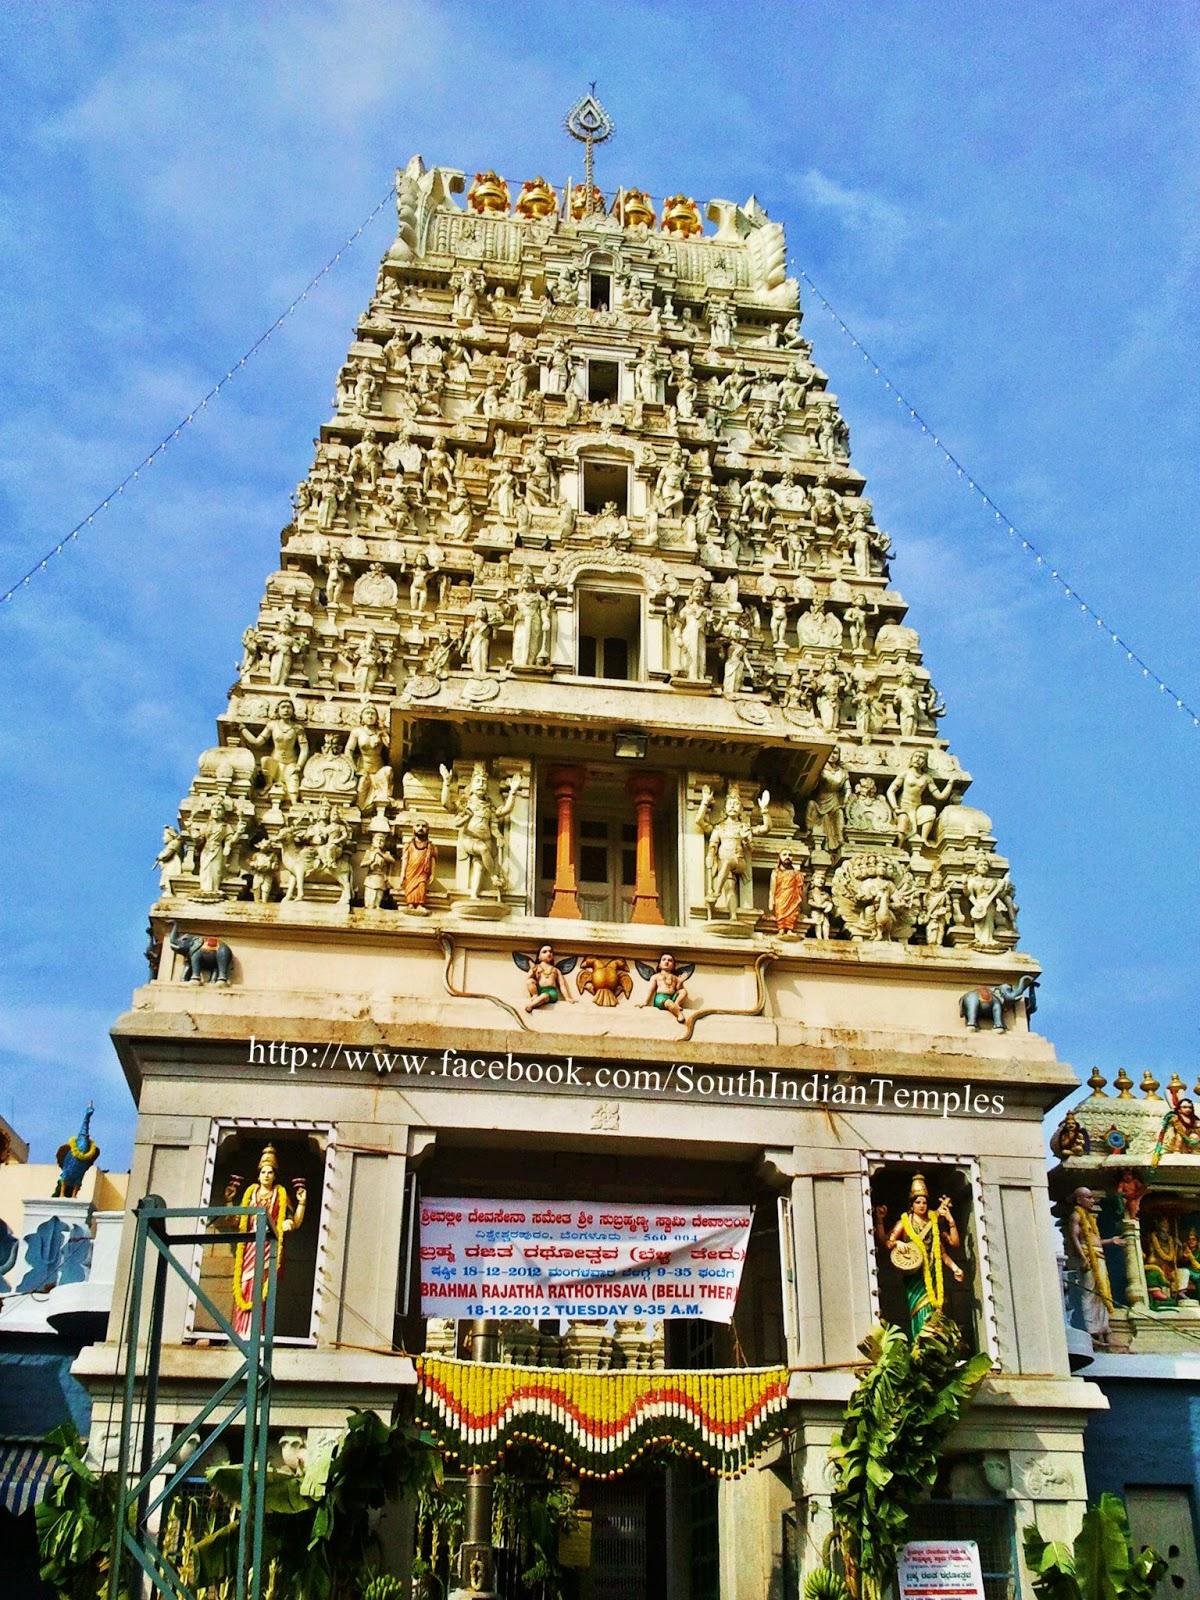 subramyana vvpuram